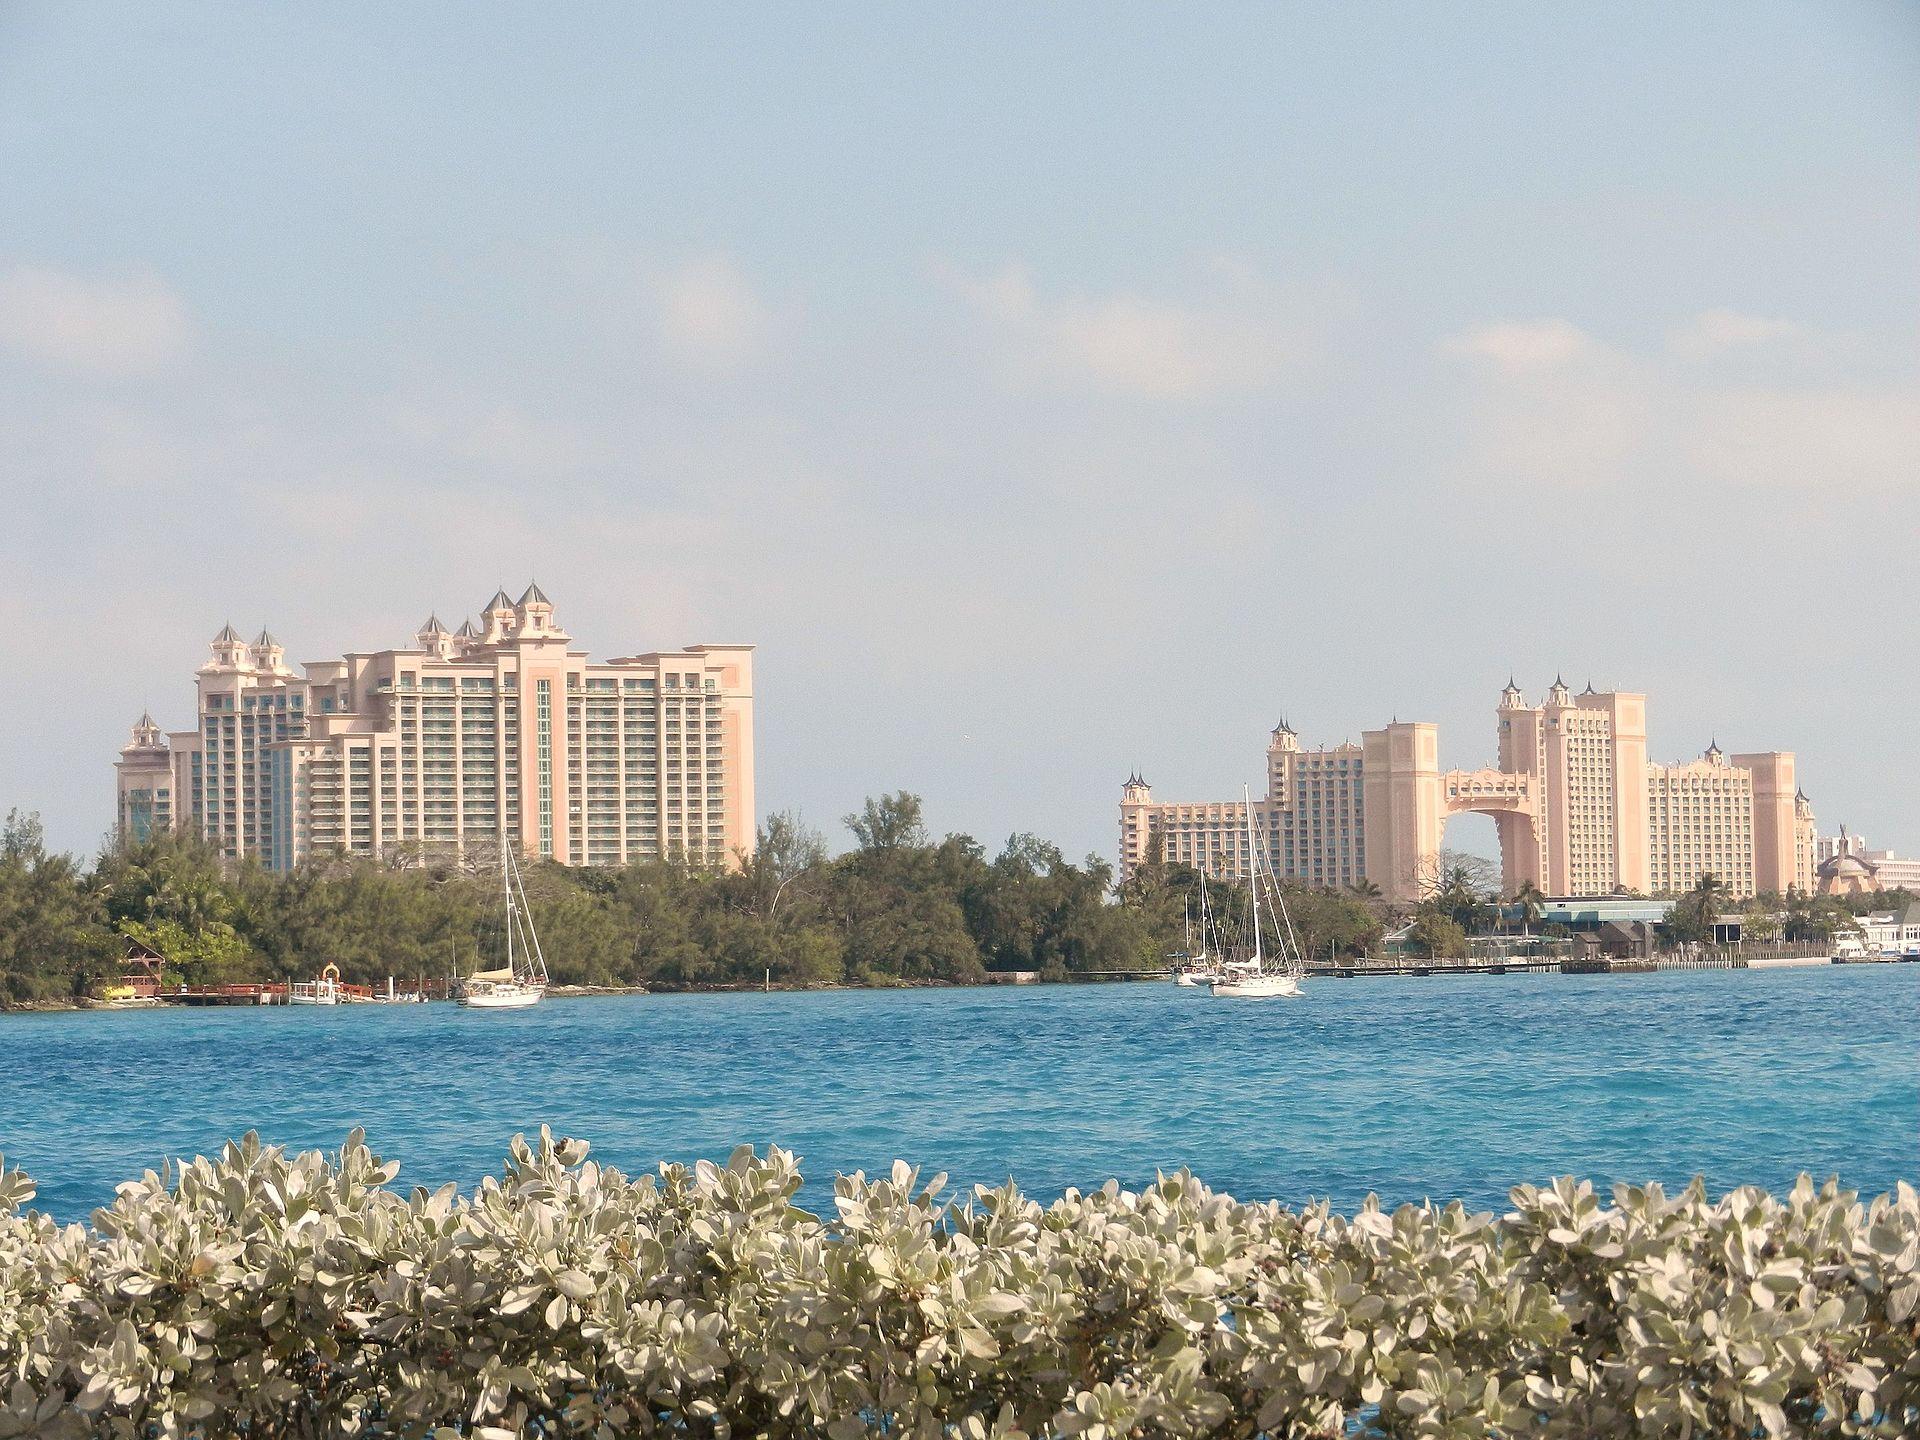 Atlantis_Hotel_in_Nassau,_Bahamas_in_January_2012_-_panoramio